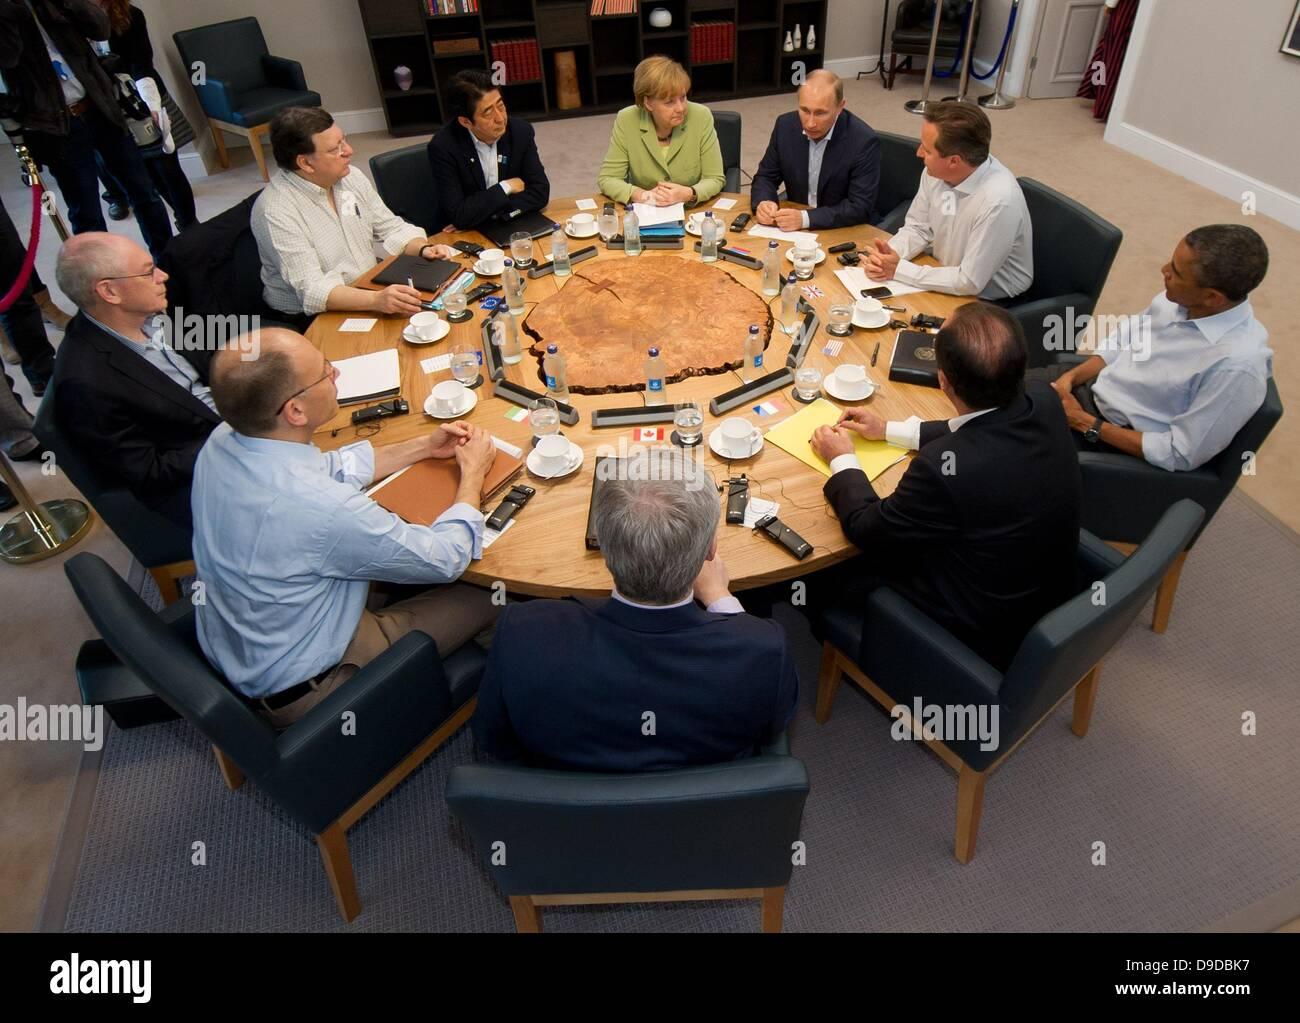 Enniskillen, Northern Ireland / Great Britain. 18th June, 2013. Participants in the G8 summit, German Chancellor Stock Photo